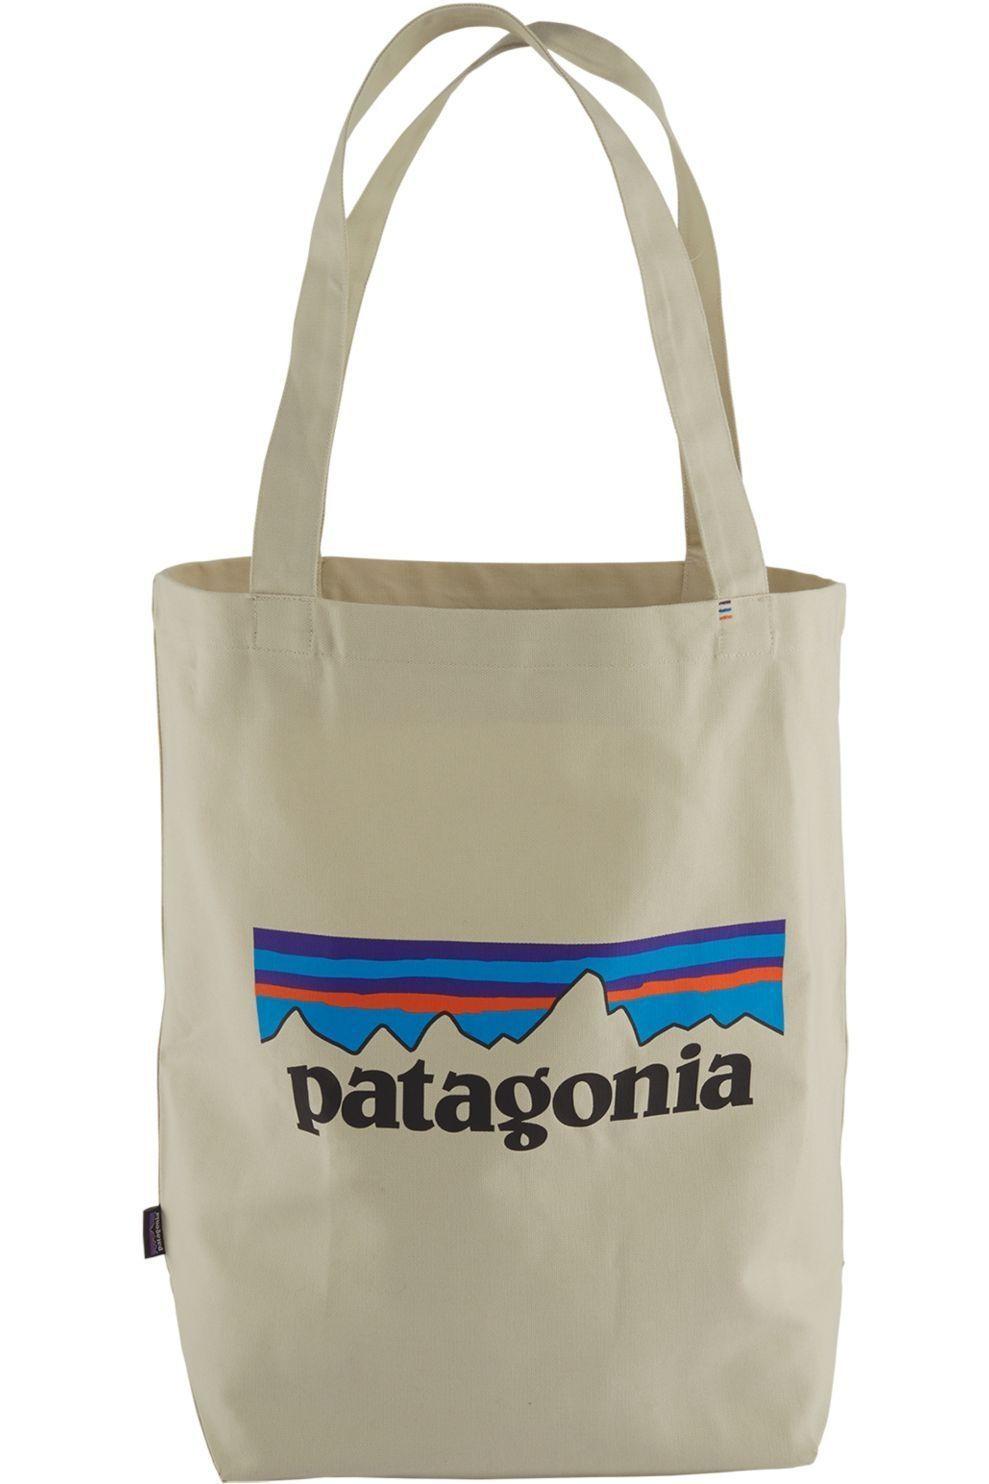 Patagonia Schoudertas Market Tote - Grijs/Blauw